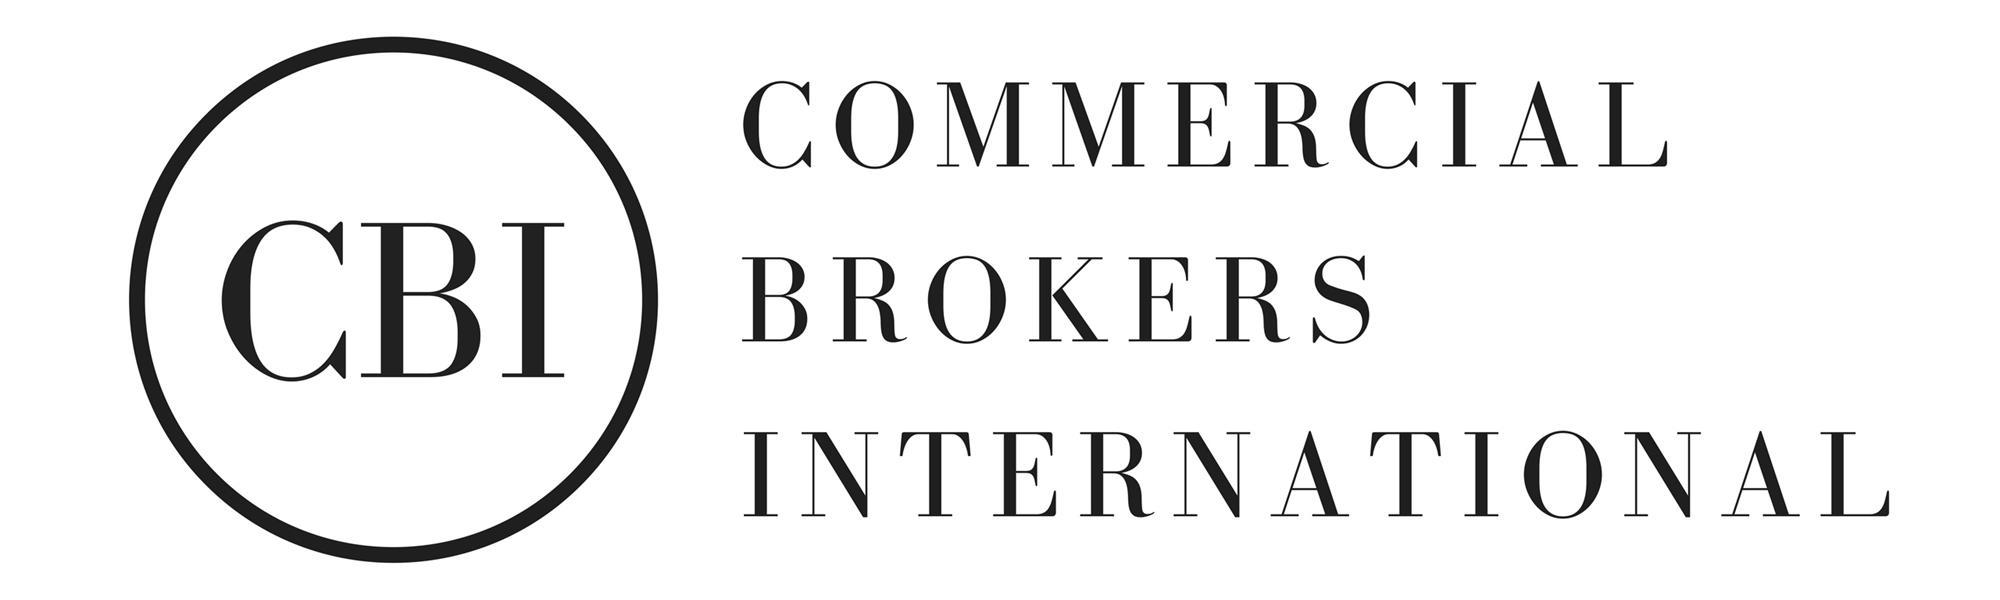 Commercial Brokers International